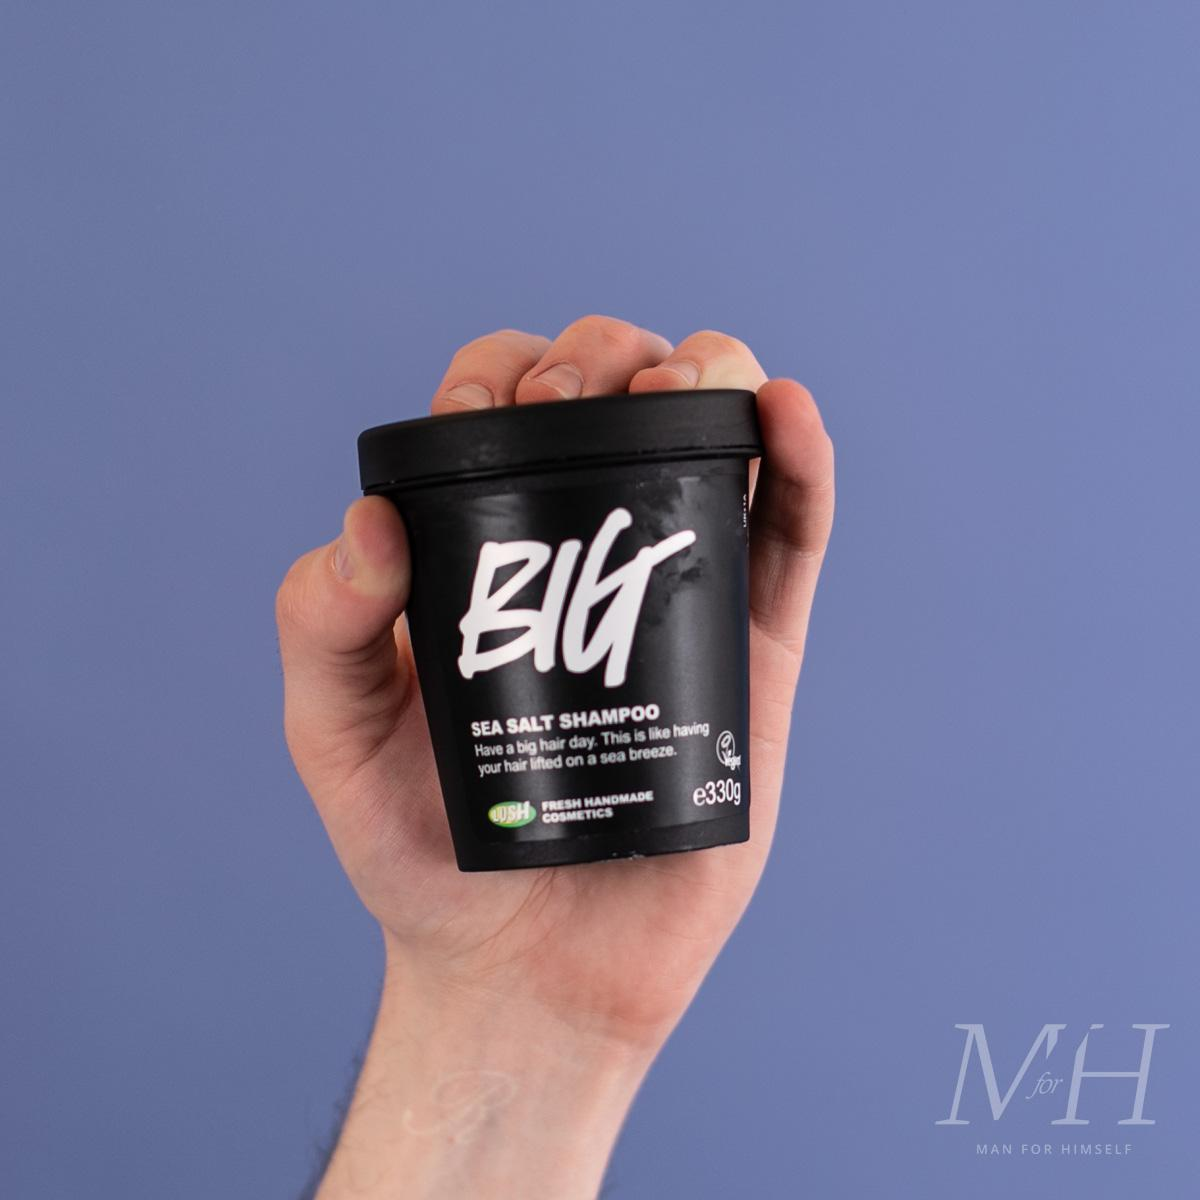 lush-big-shampoo-sea-salt-product-review-man-for-himself